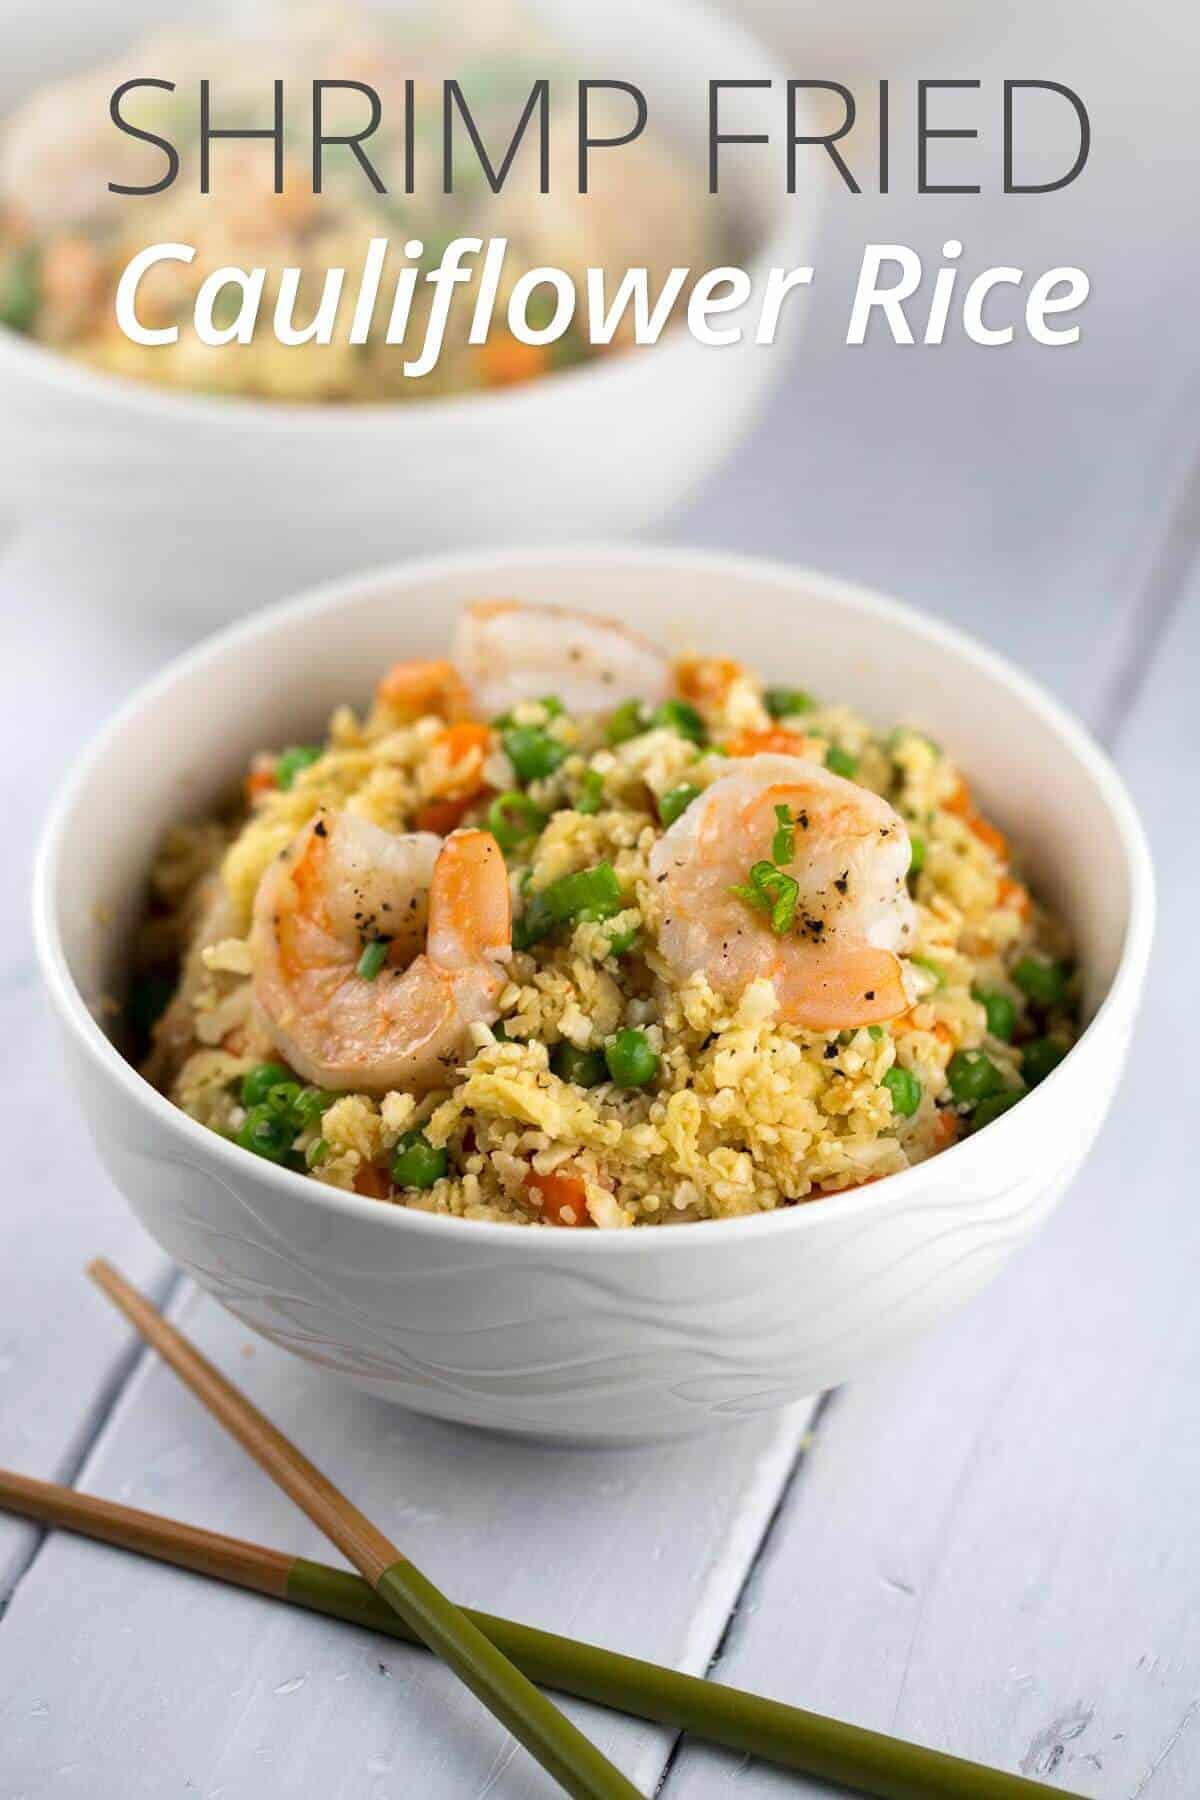 asian-inspired-shrimp-fried-cauliflower-rice-healthy-recipe